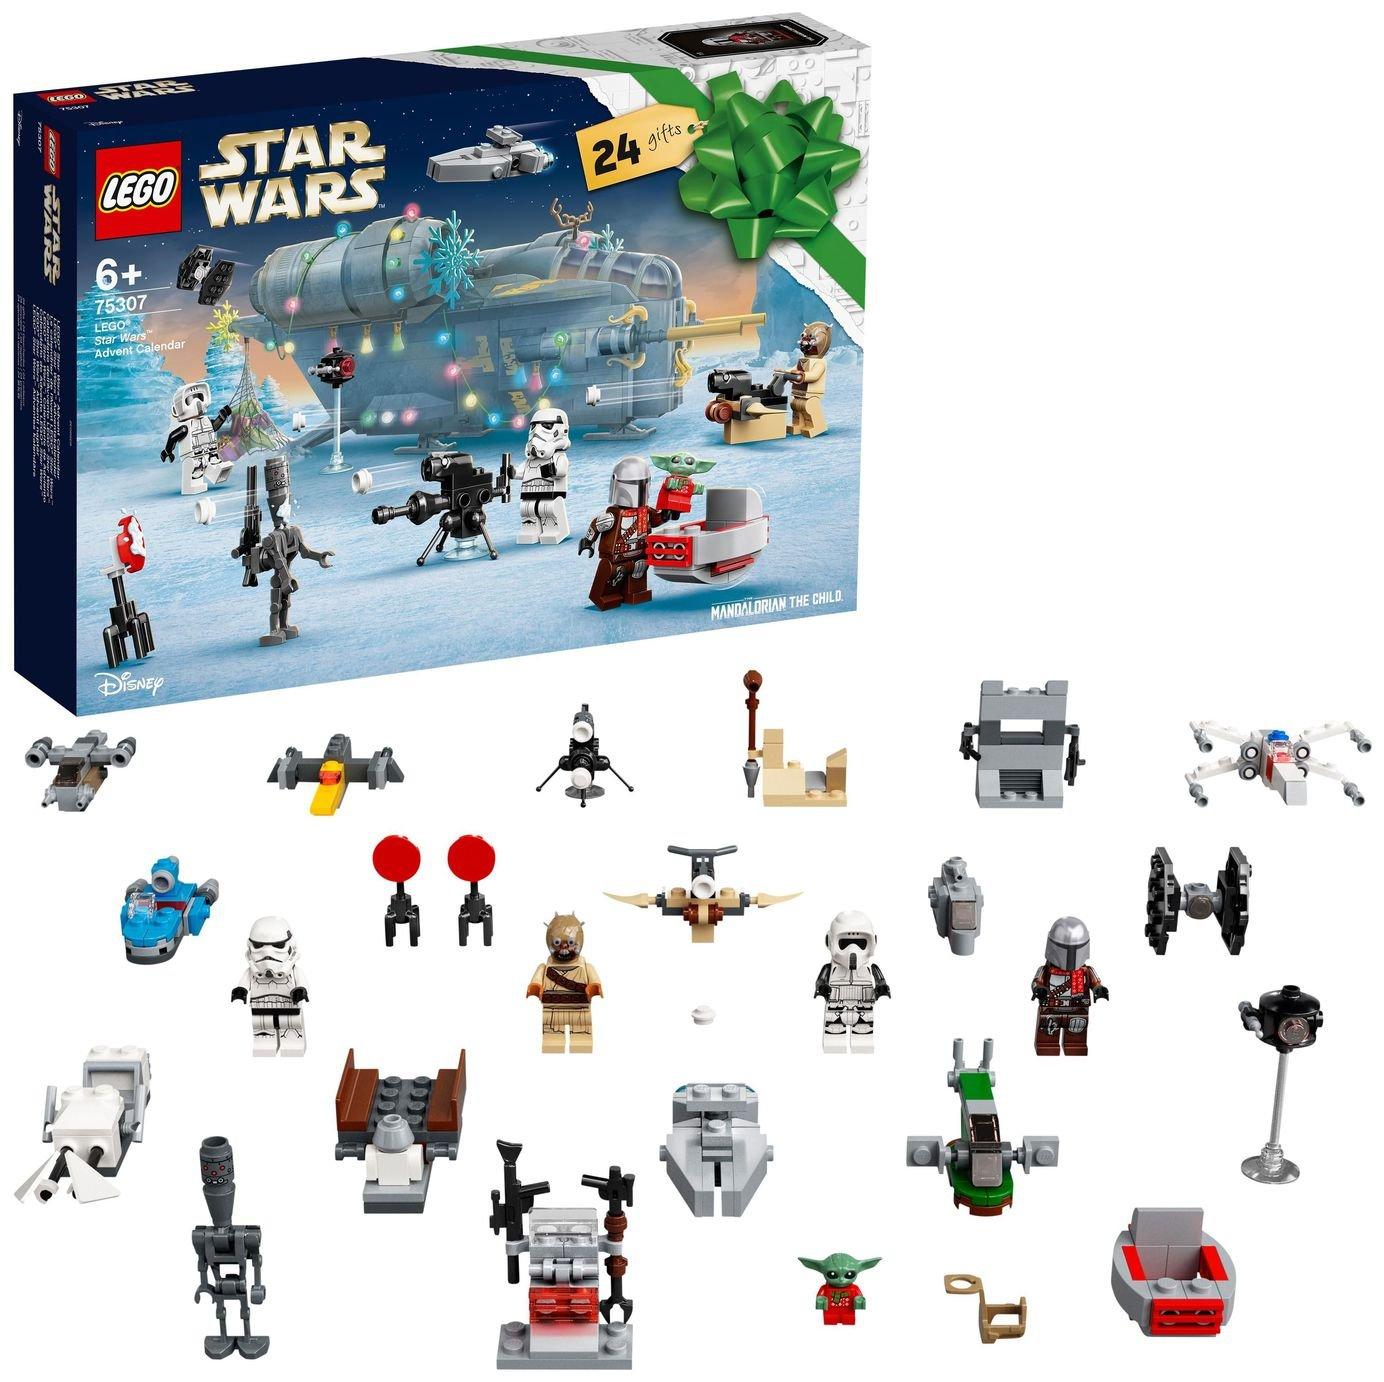 LEGO Star Wars Advent Calendar Christmas Toys for Kids 75307